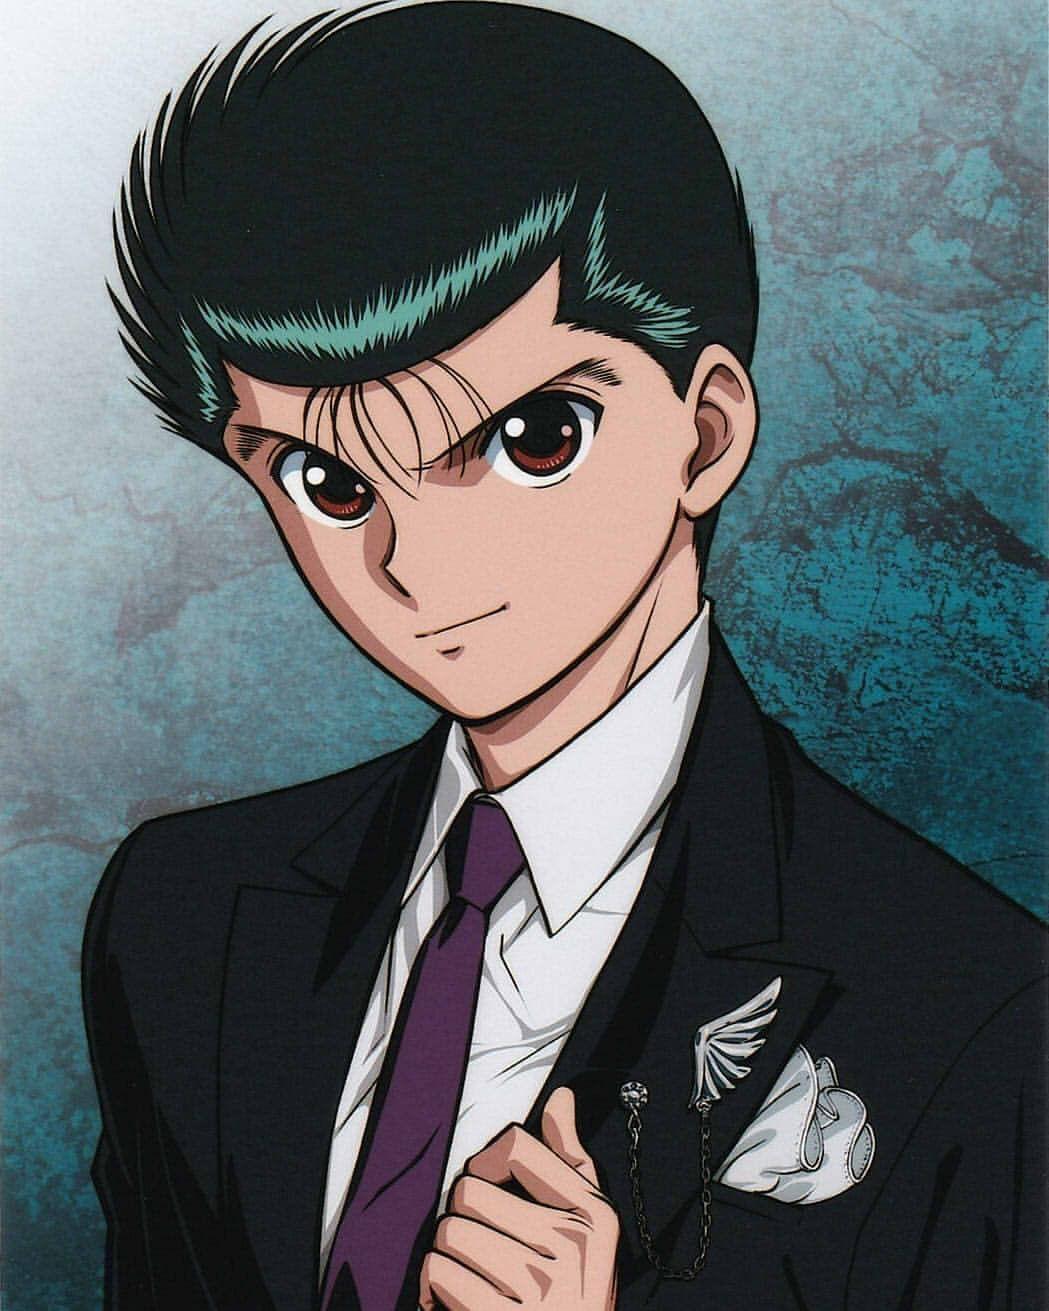 Yusuke Yu Yu Hakusho Anime Drawings Anime 90s Anime